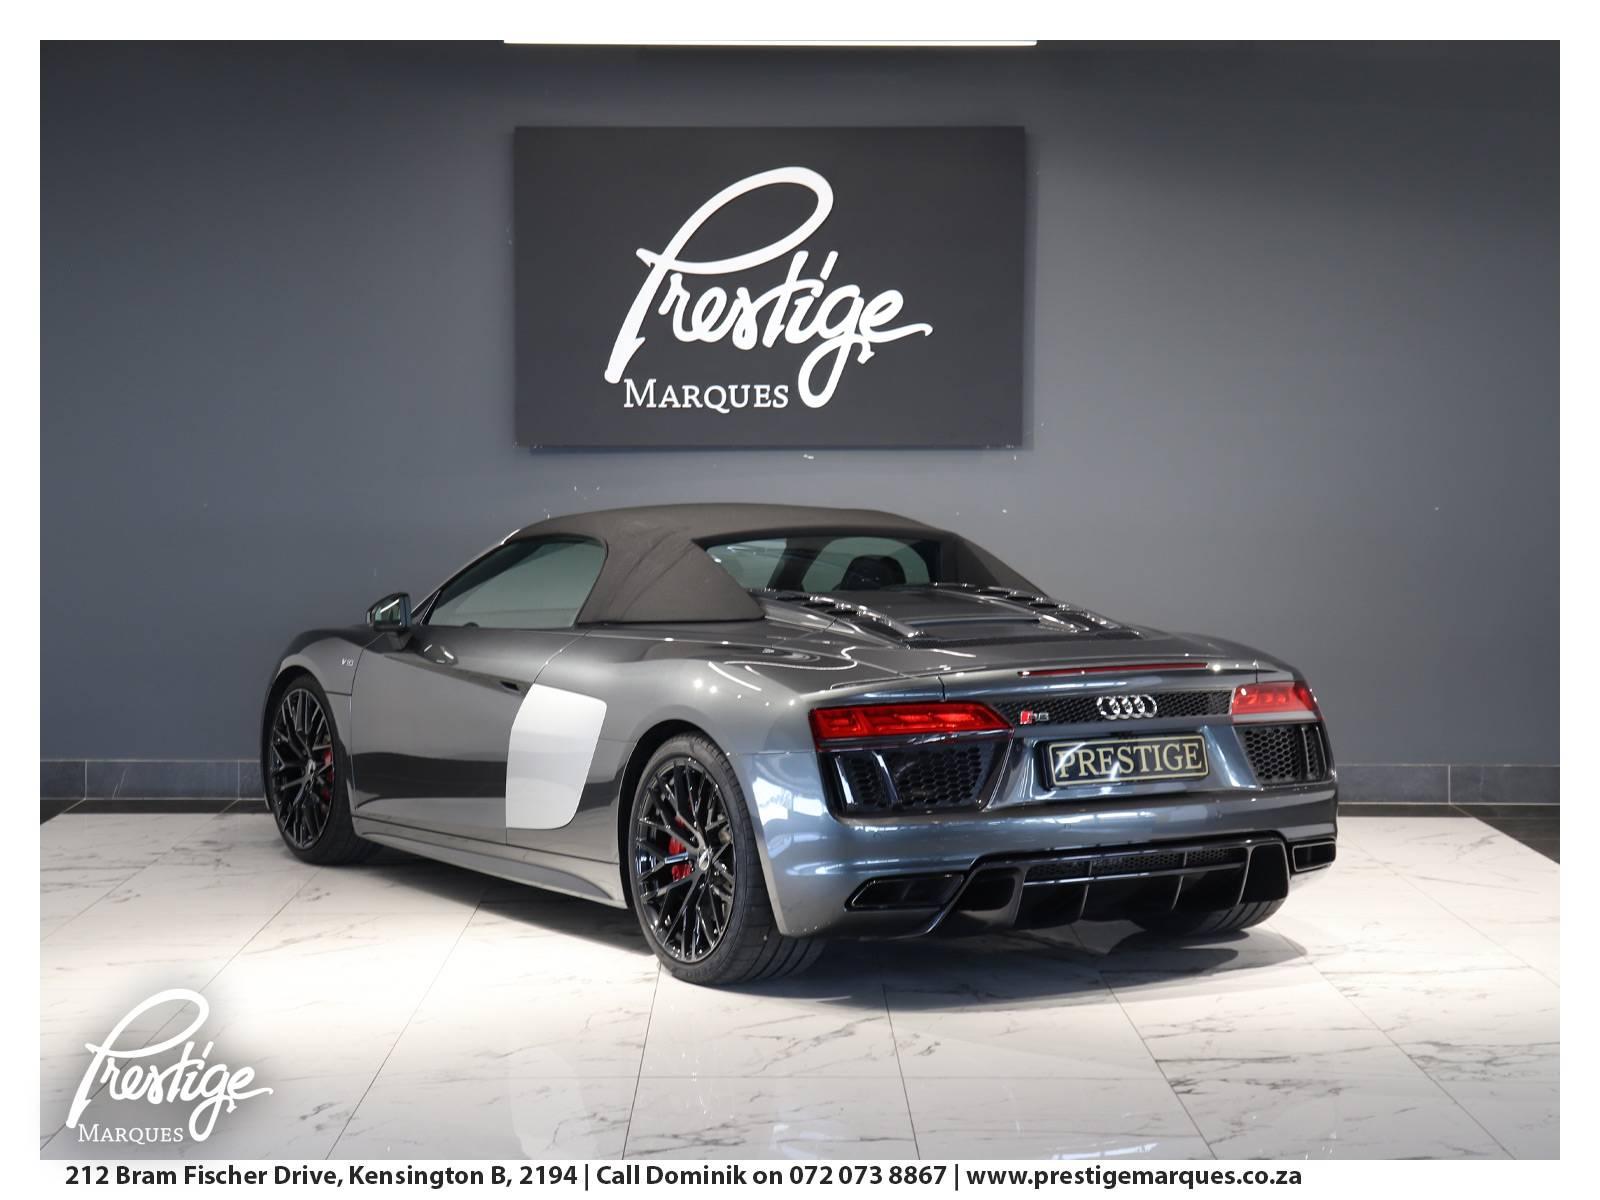 2019-Audi-R8-Prestige-Marques-Randburg-Sandton-8